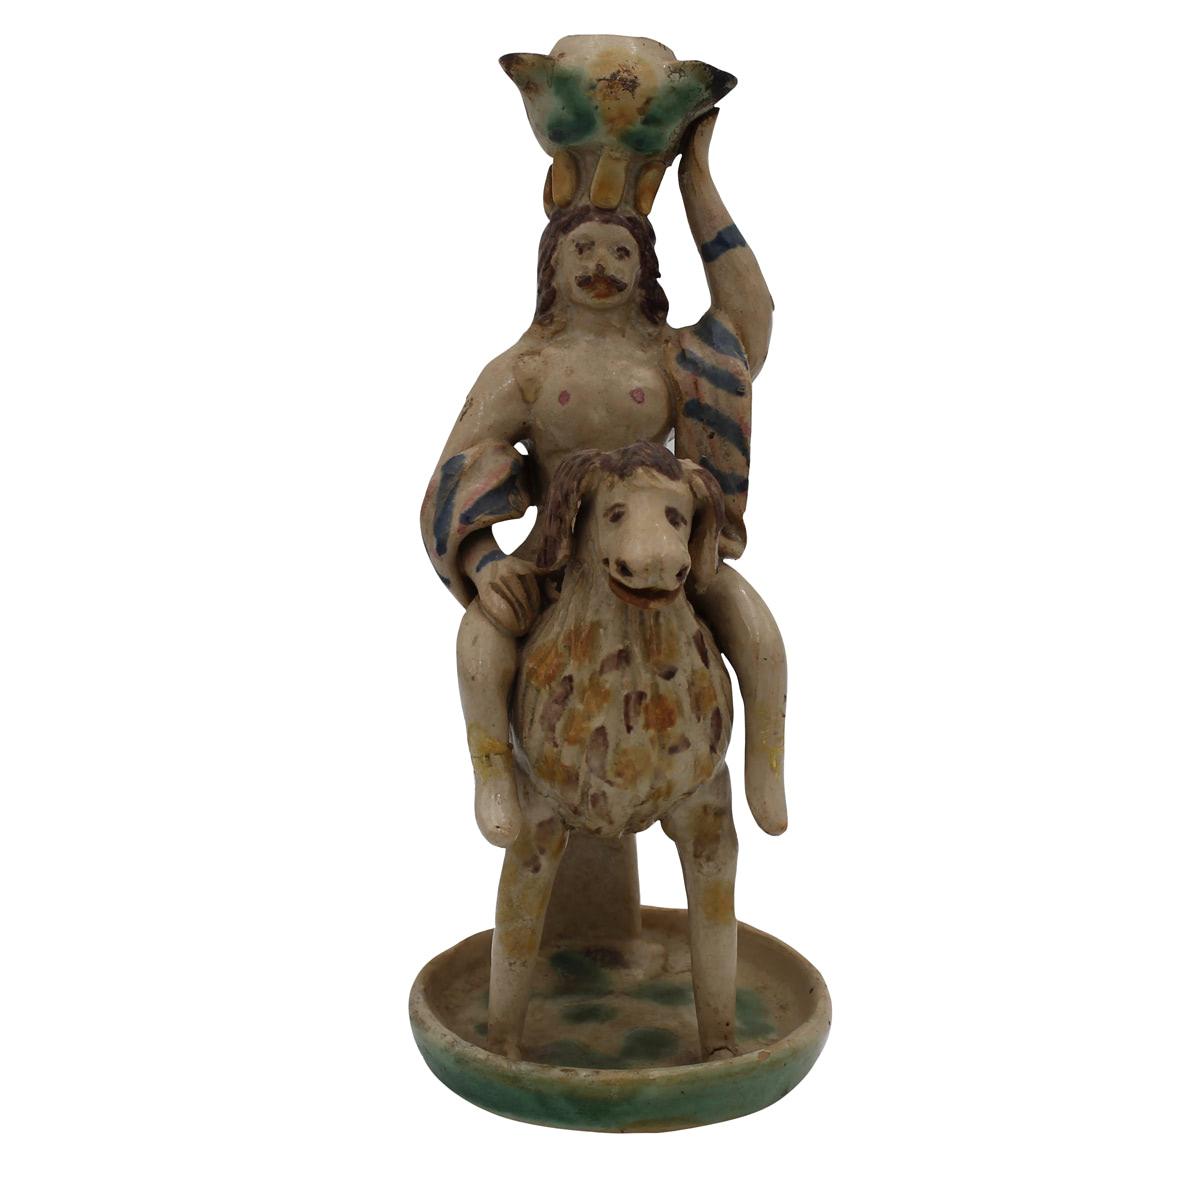 LUCERNA DI FORMA ANTROPOMORFA-ANTHROPOMORPHIC LAMP